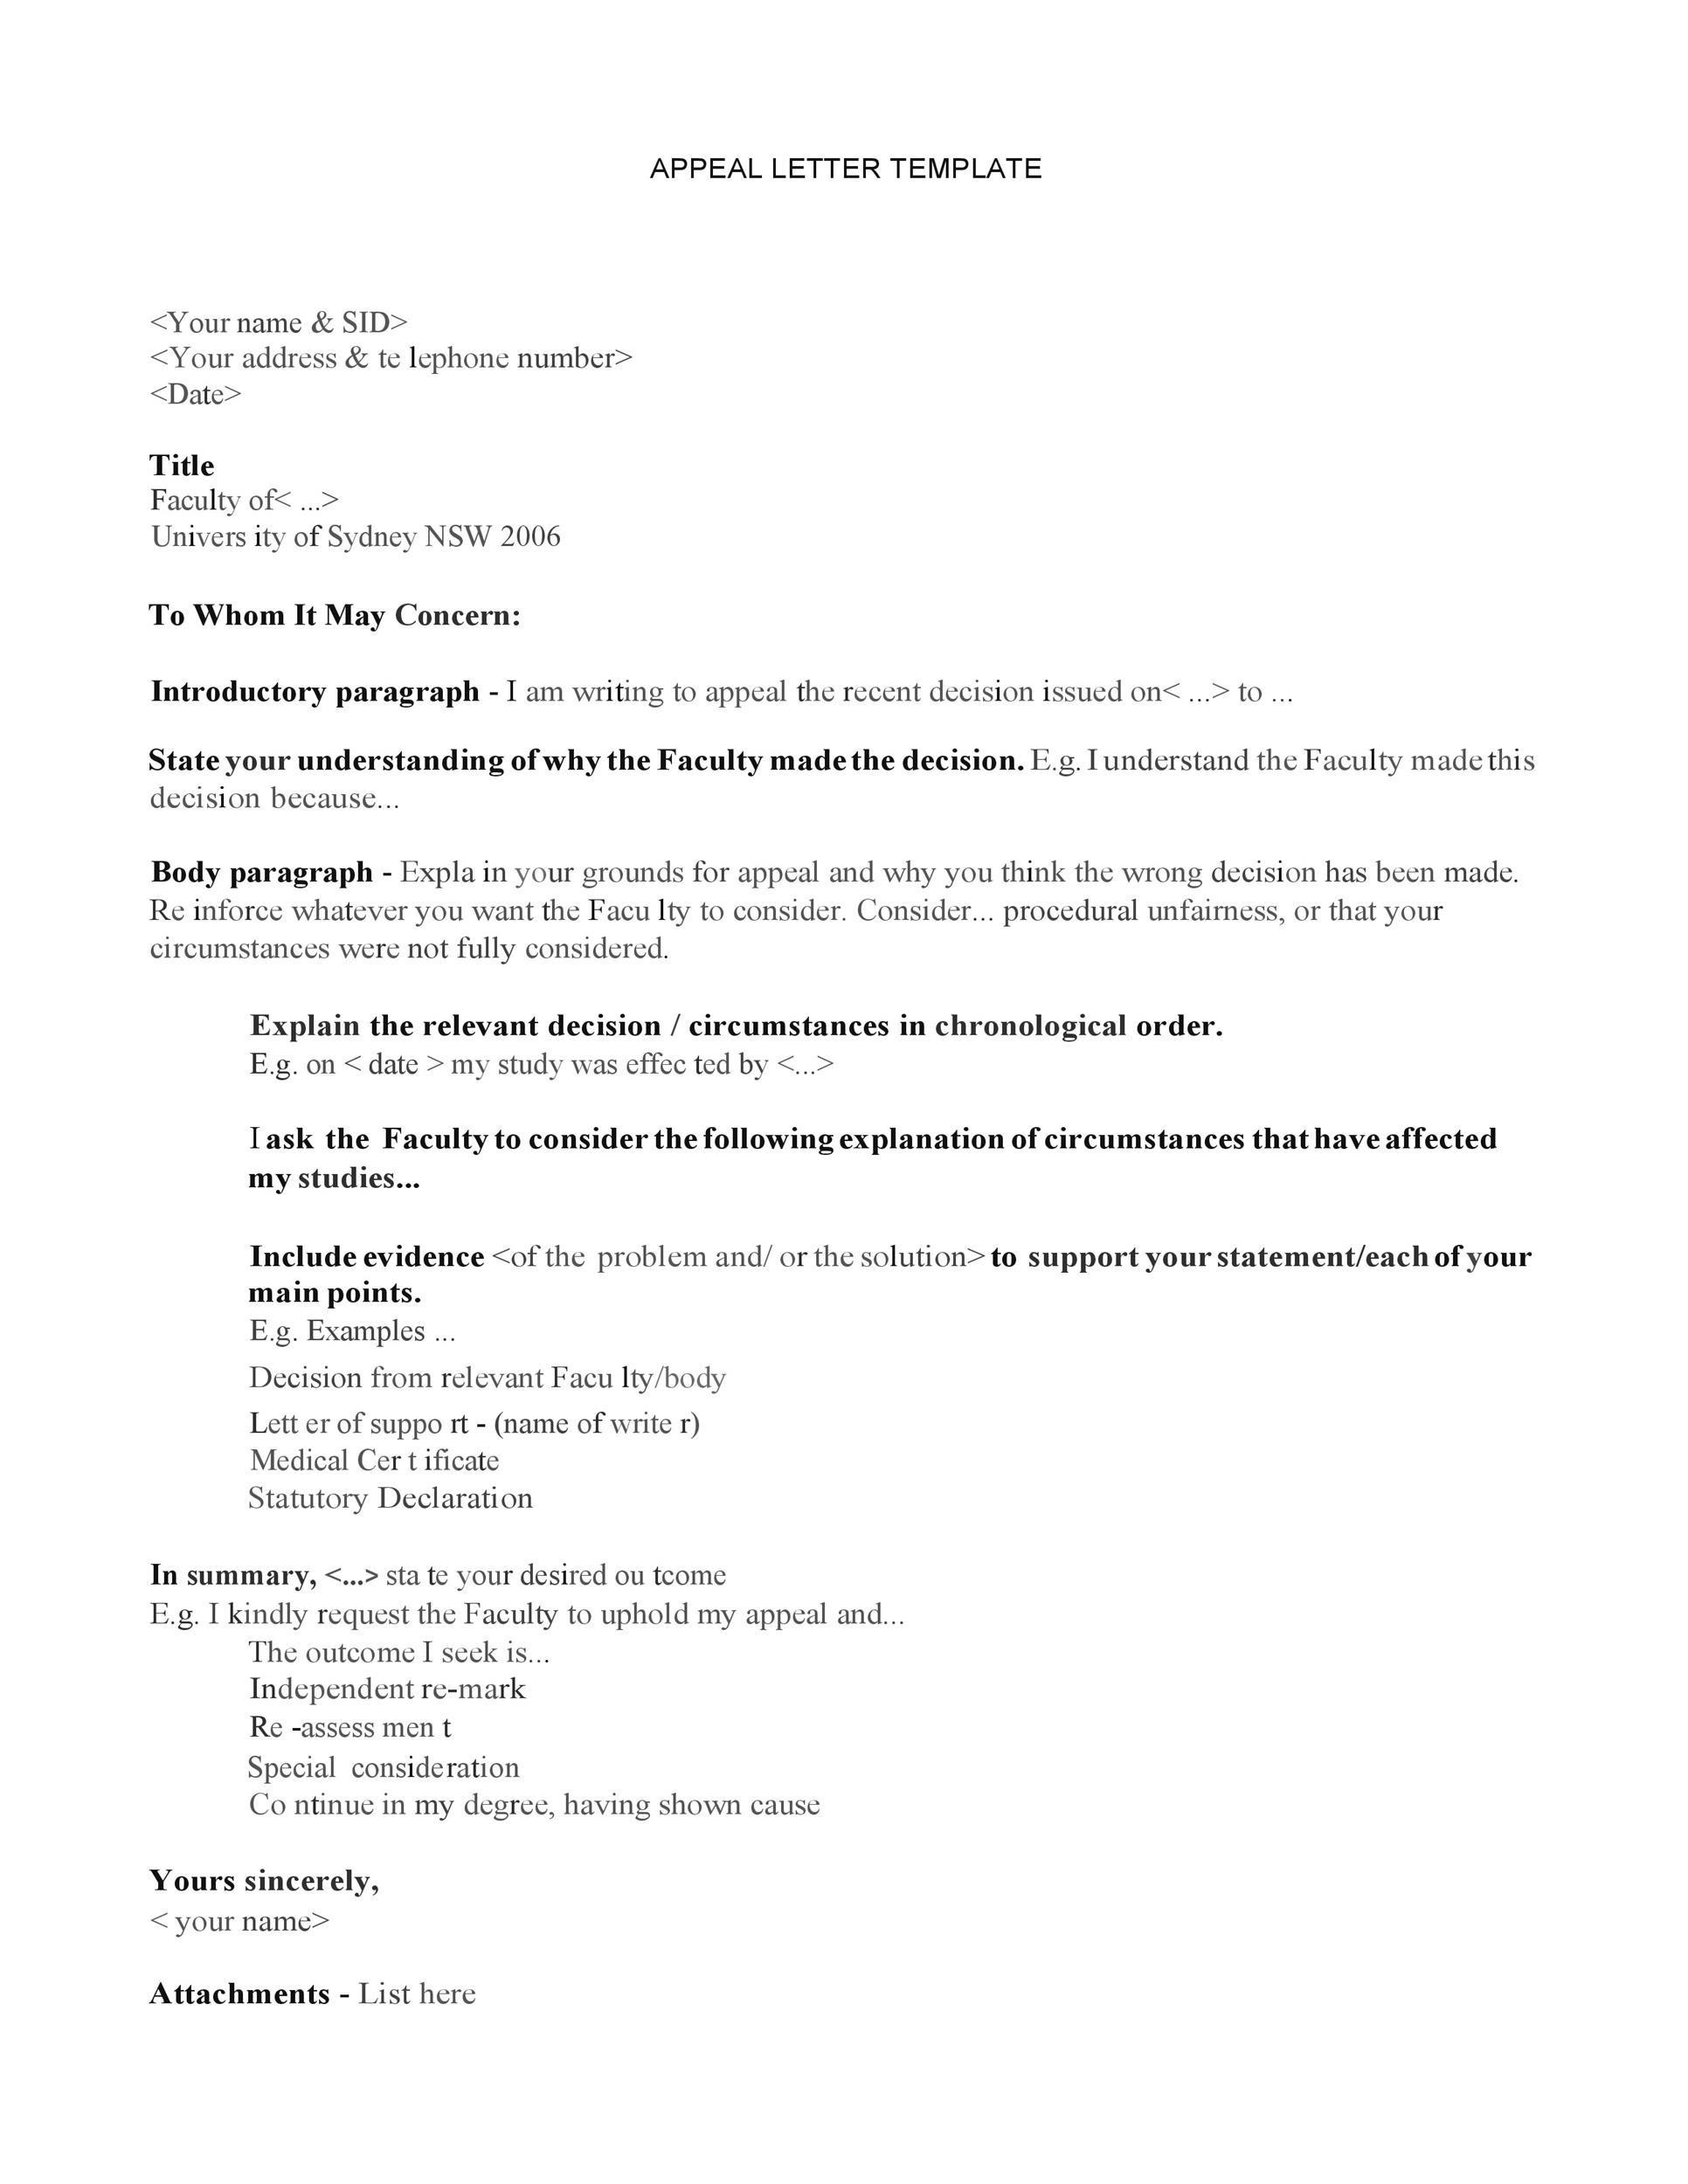 Sample Academic Dismissal Appeal Letter from templatelab.com